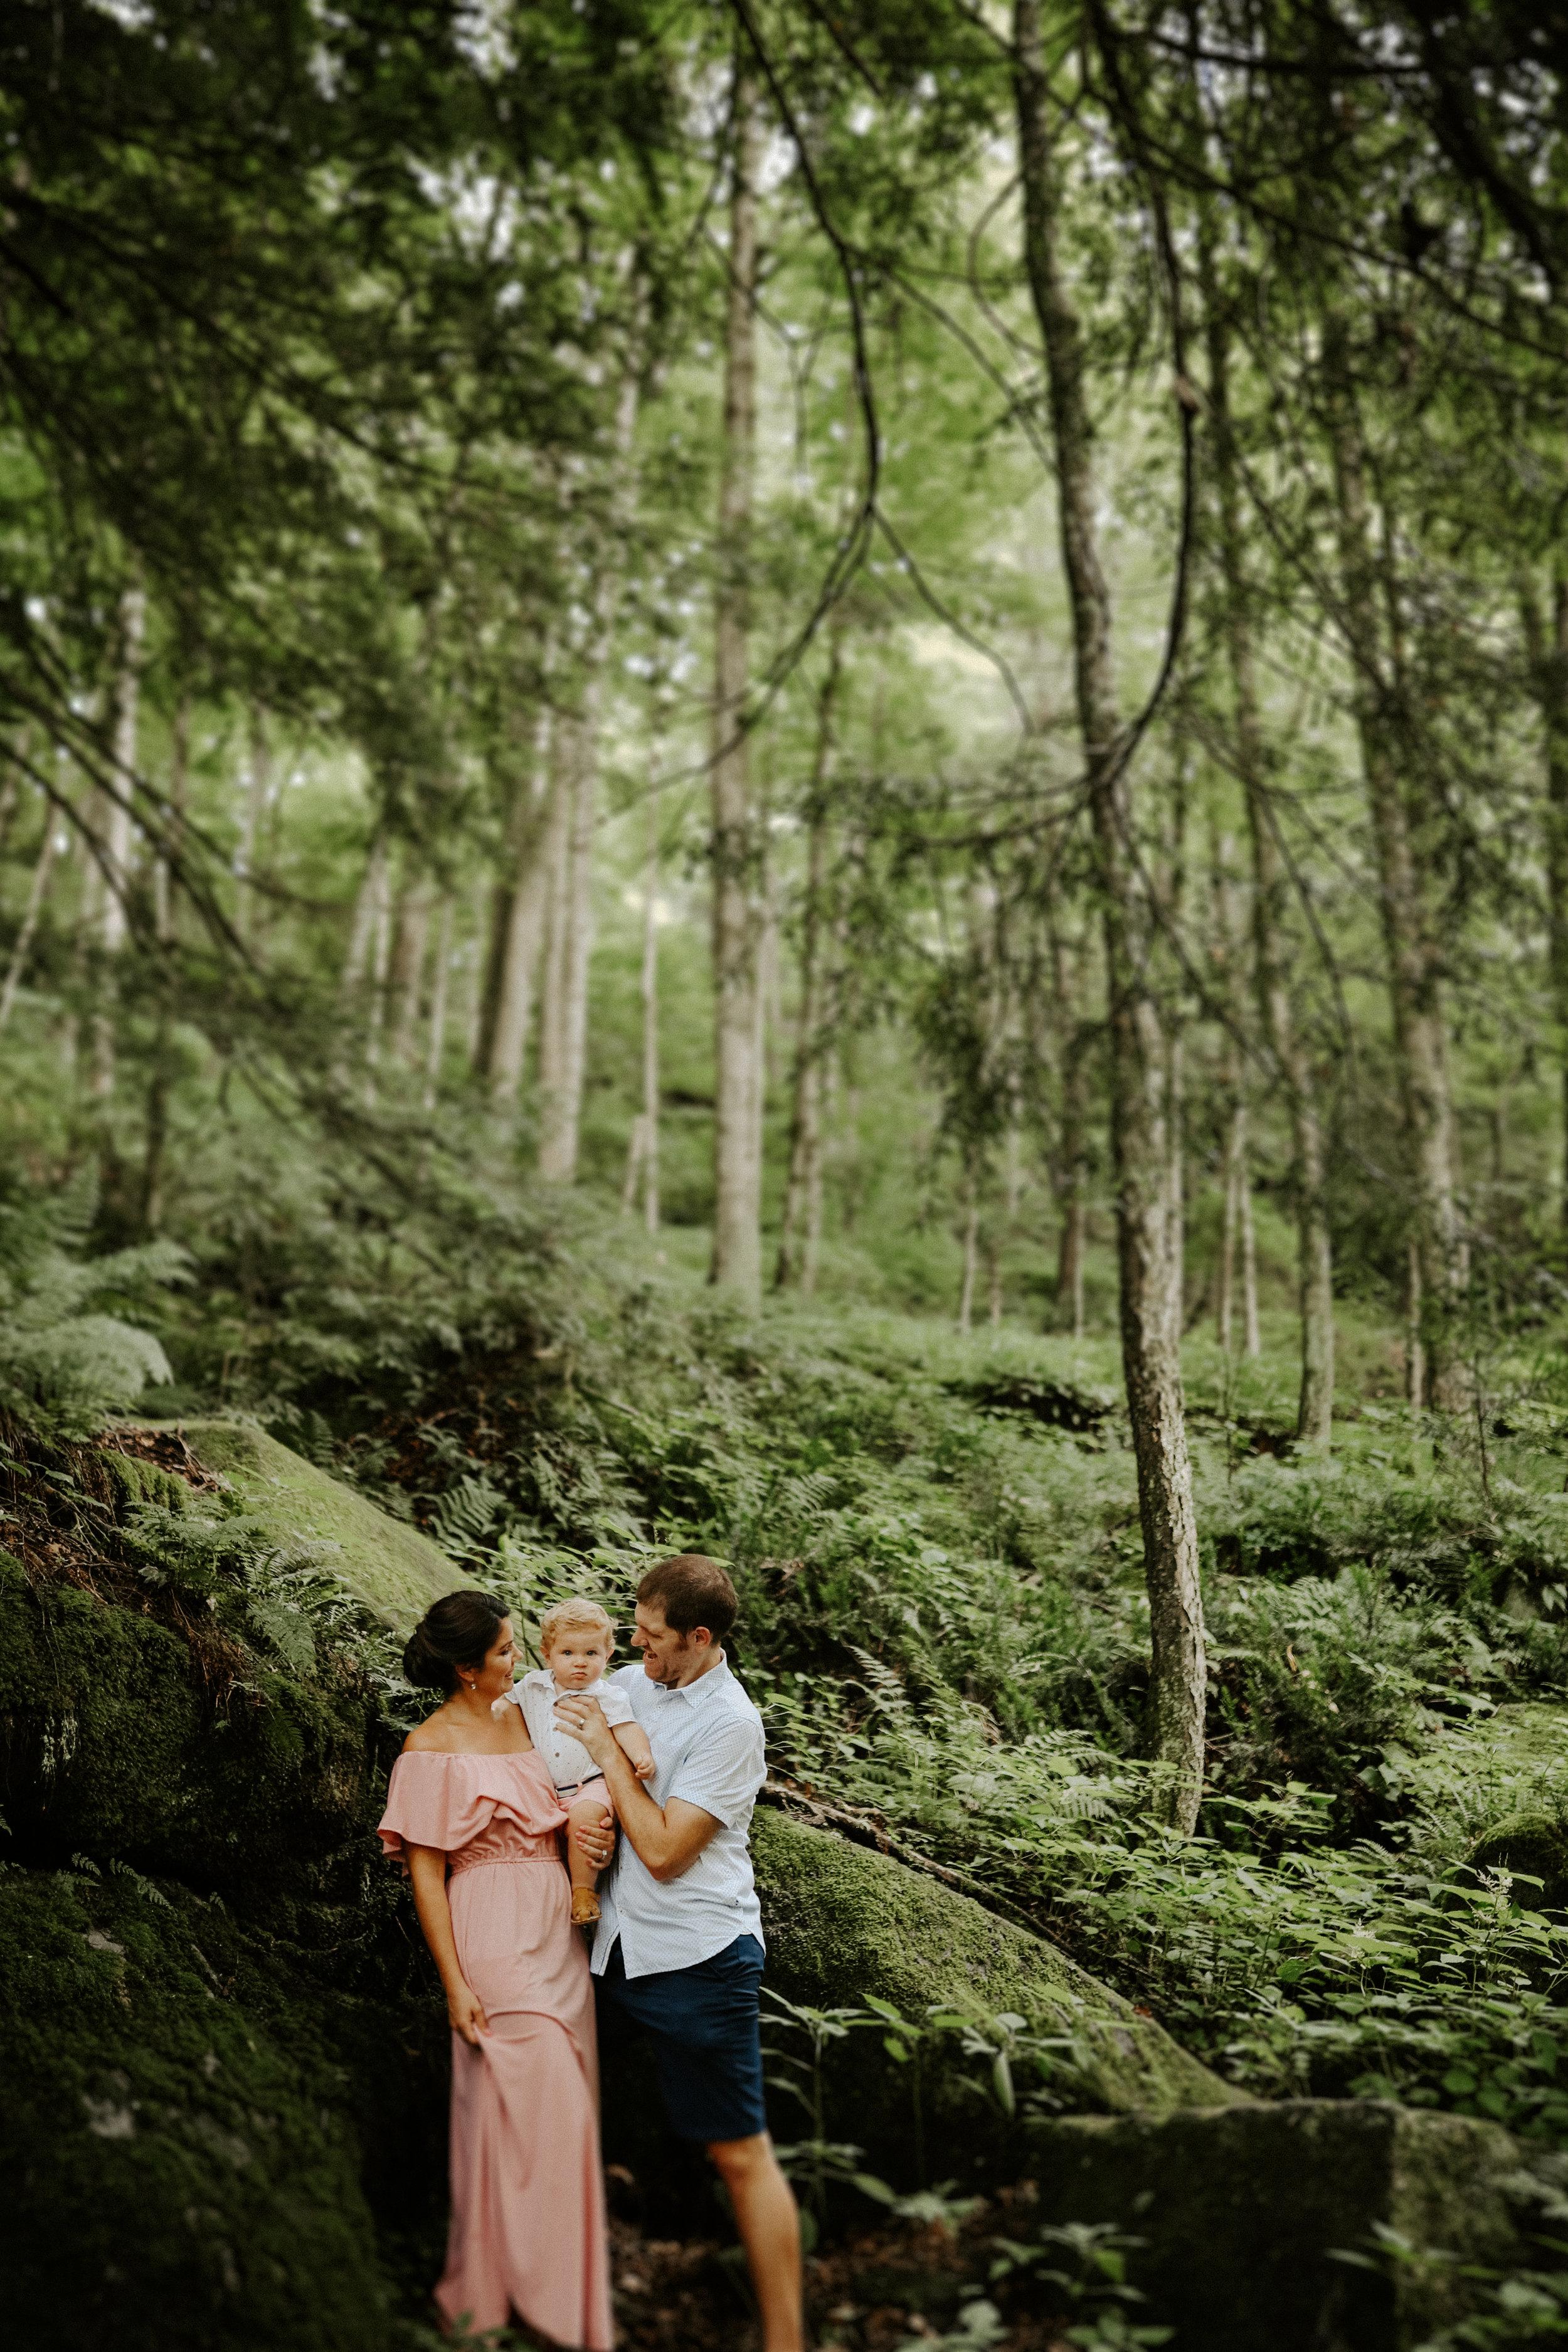 Irina + Erik - Family in the woods